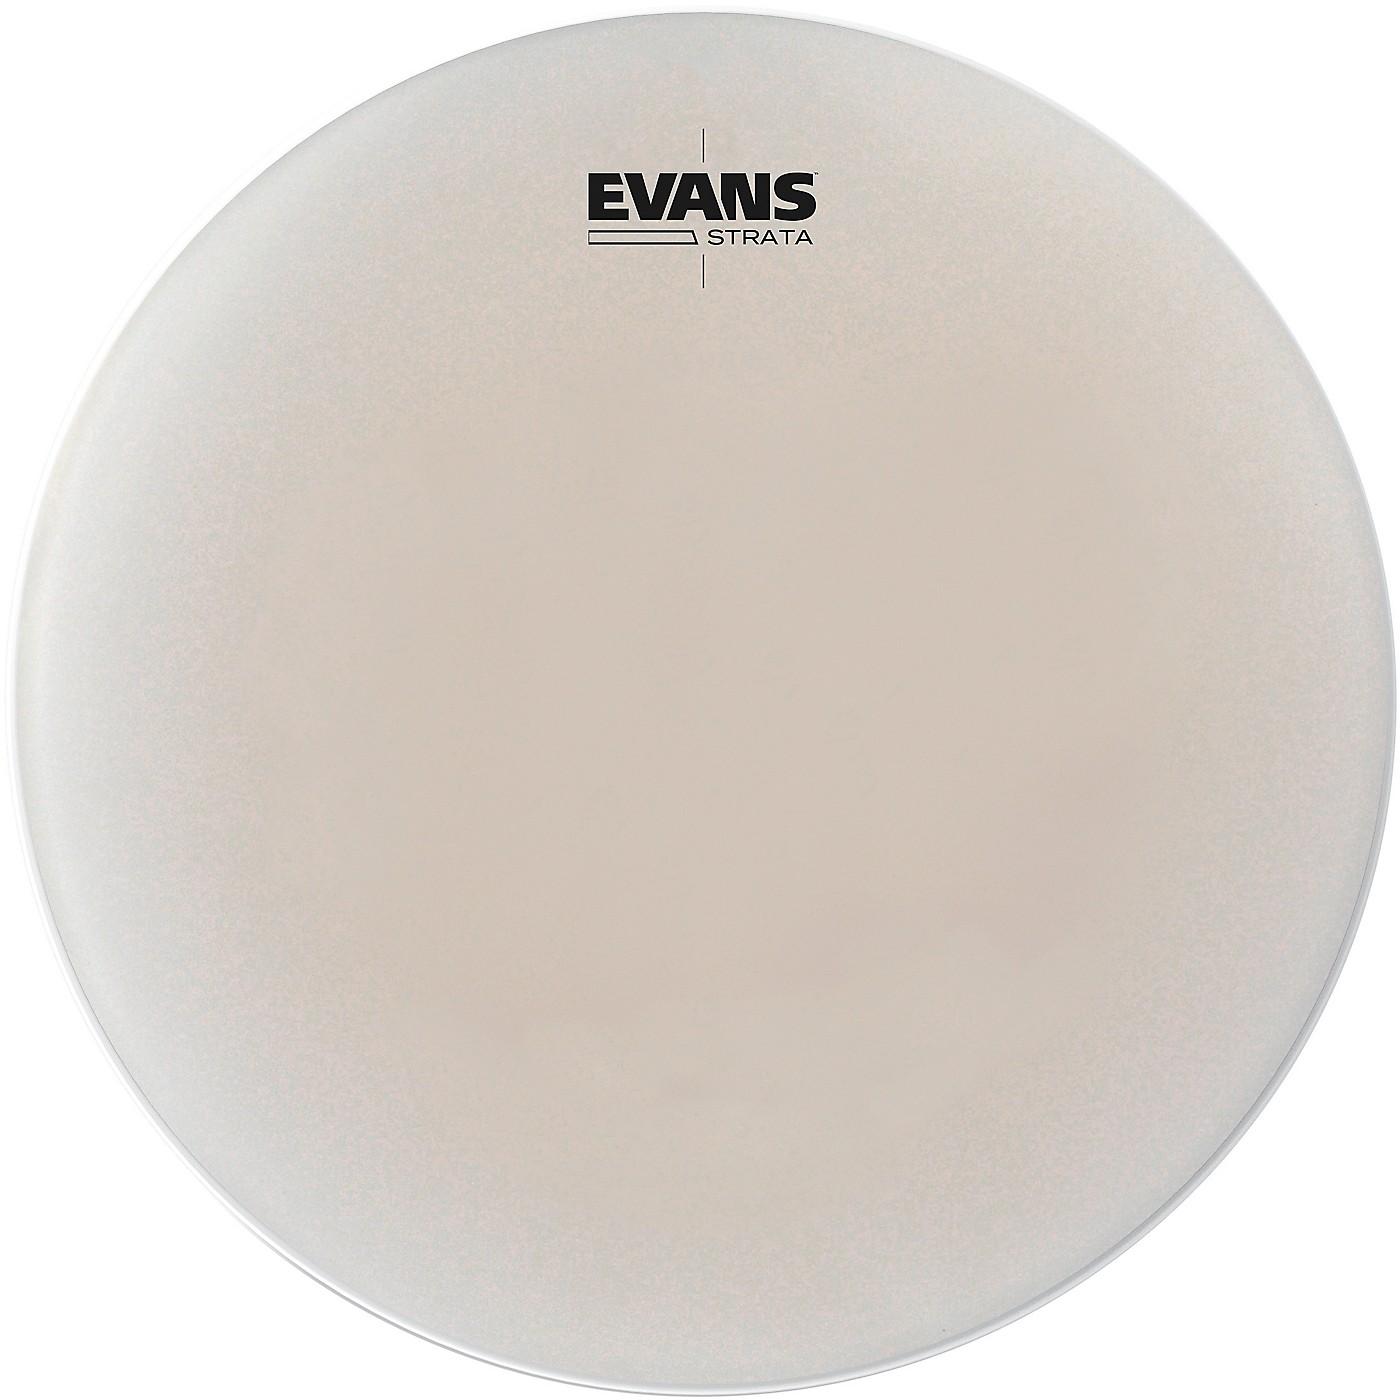 Evans Strata Series Timpani Drum Head thumbnail